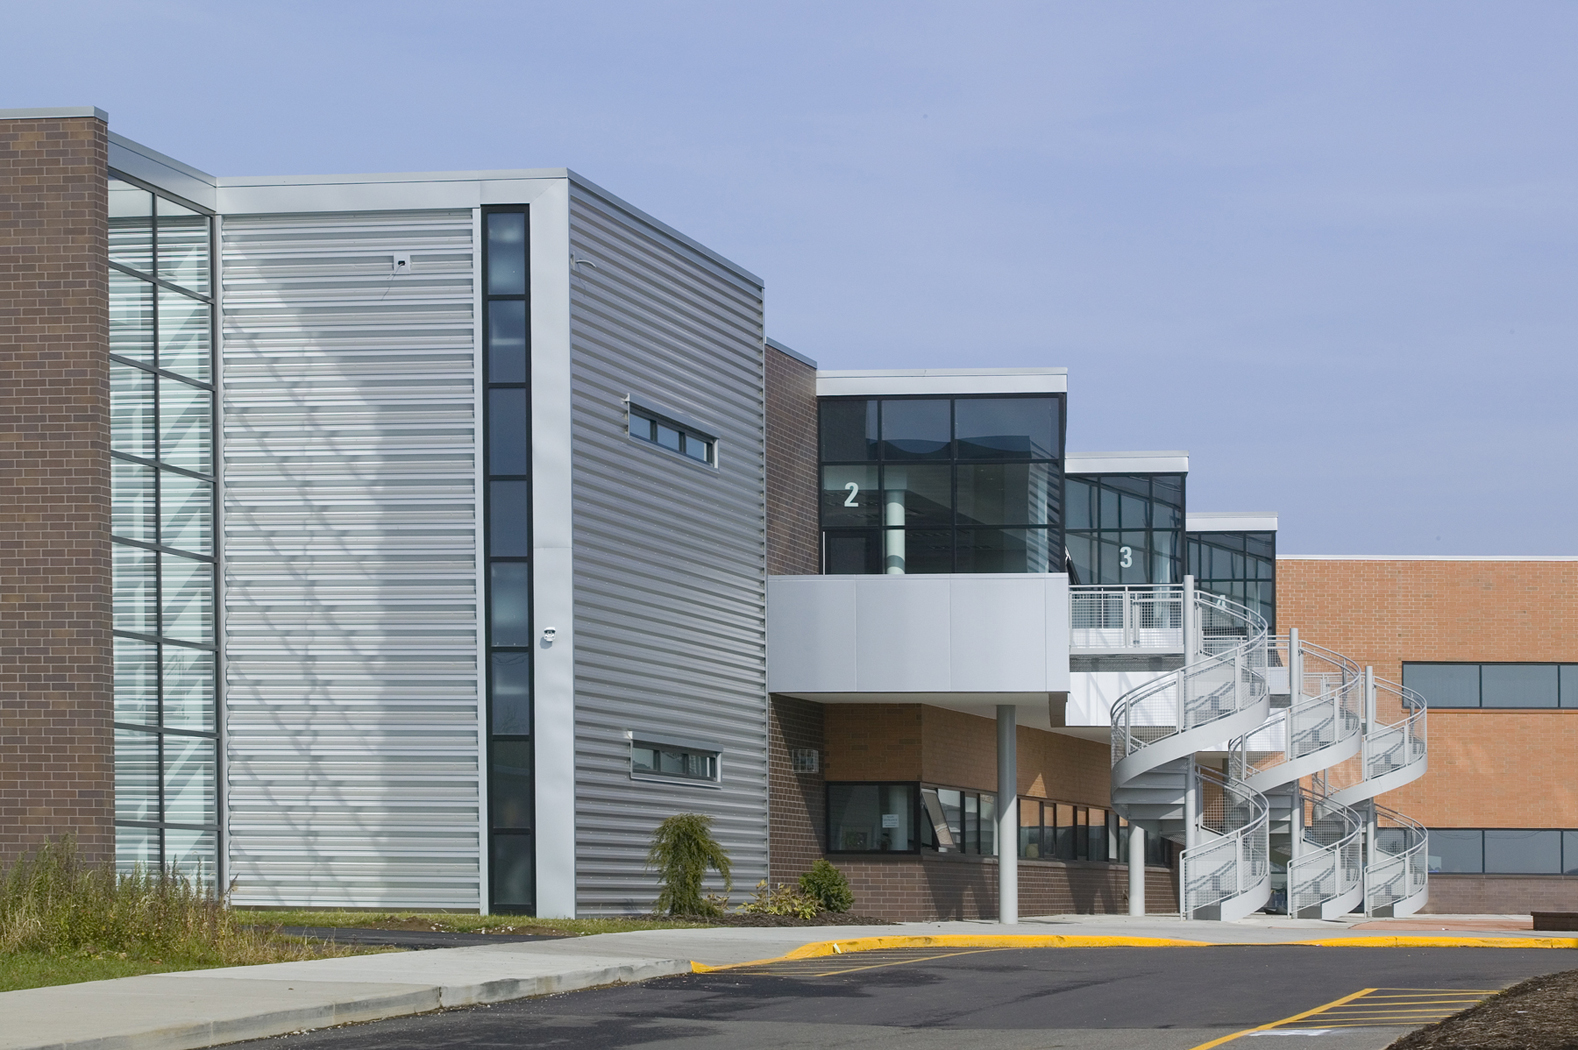 GLENOAK HIGH SCHOOL - CANTON, OH